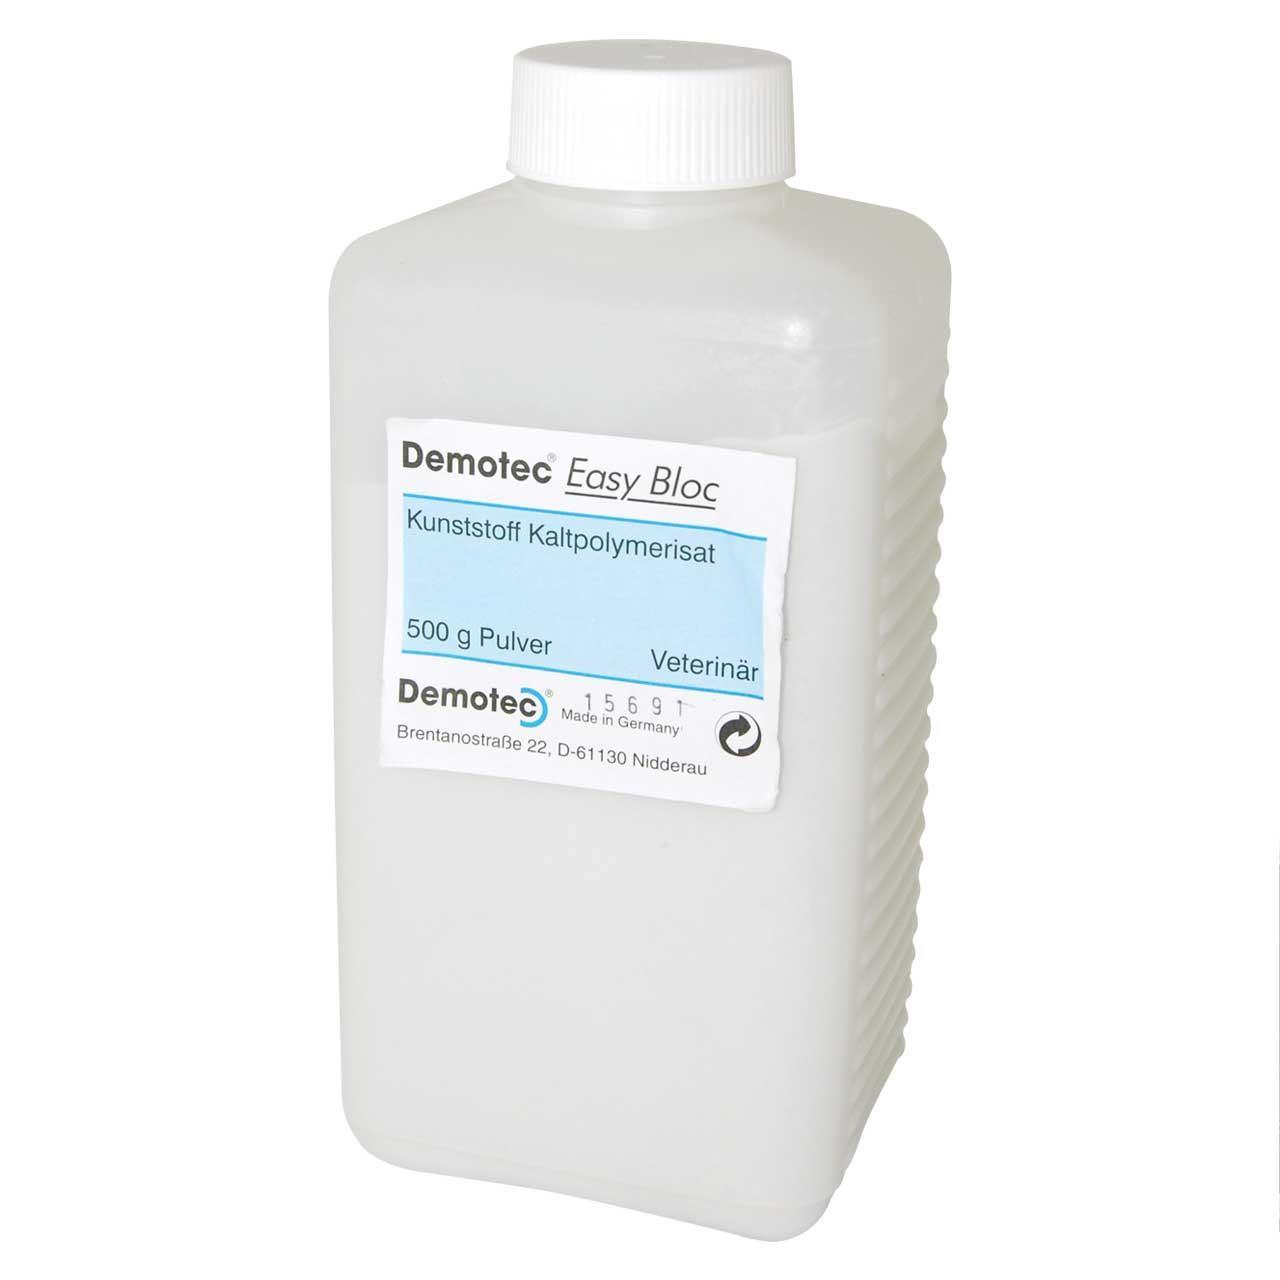 Demotec Easy Bloc Express Pulver 500g